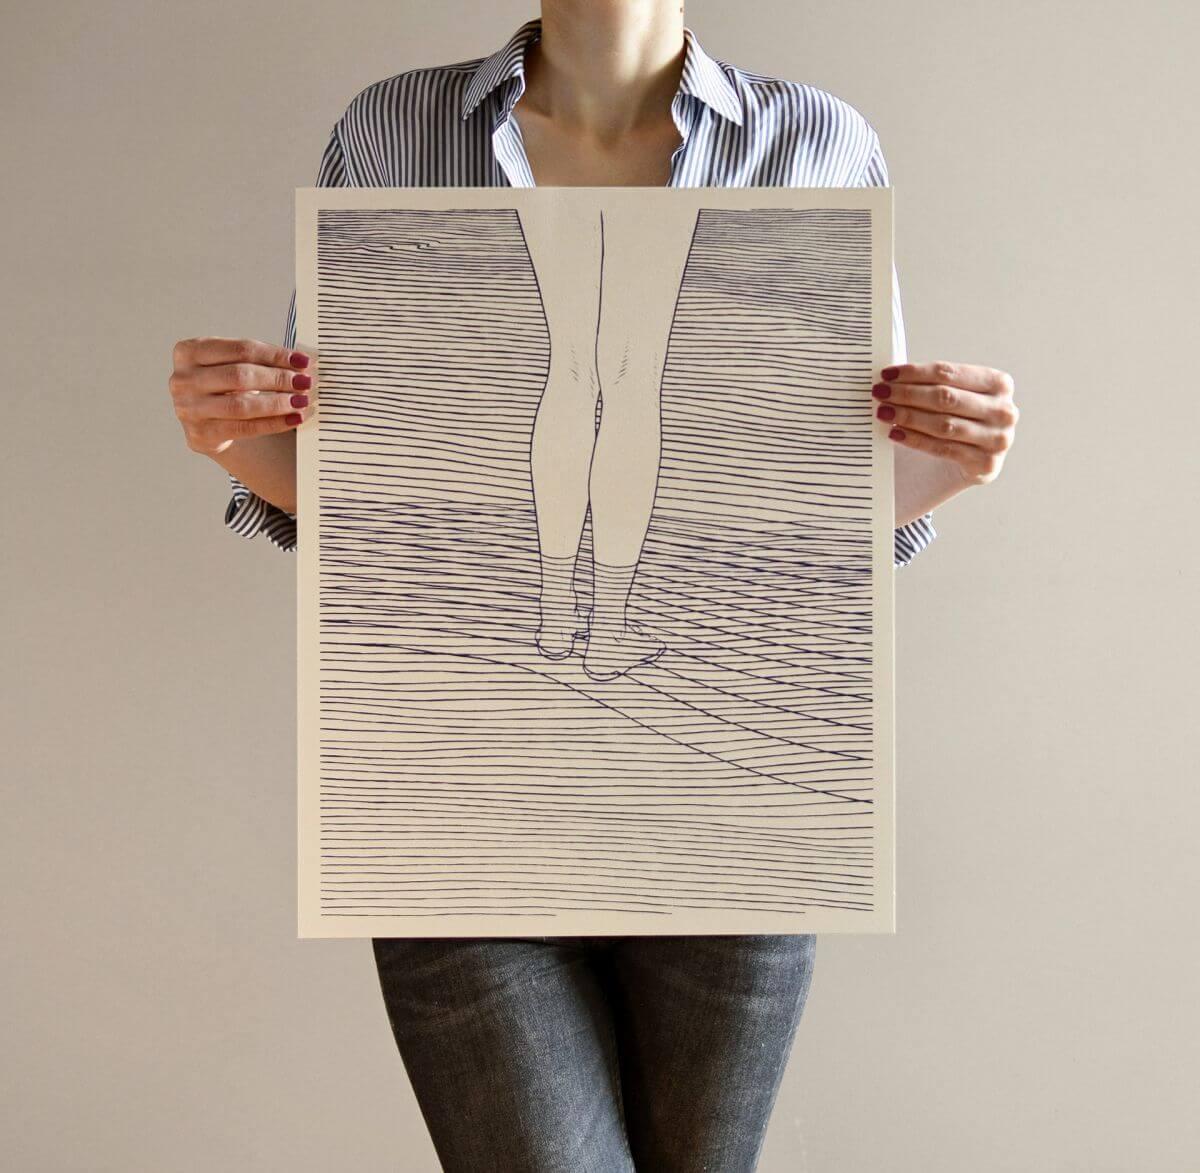 bartosz kosowski, ilustracja, lolita plakat, ilustrator, niezła sztuka